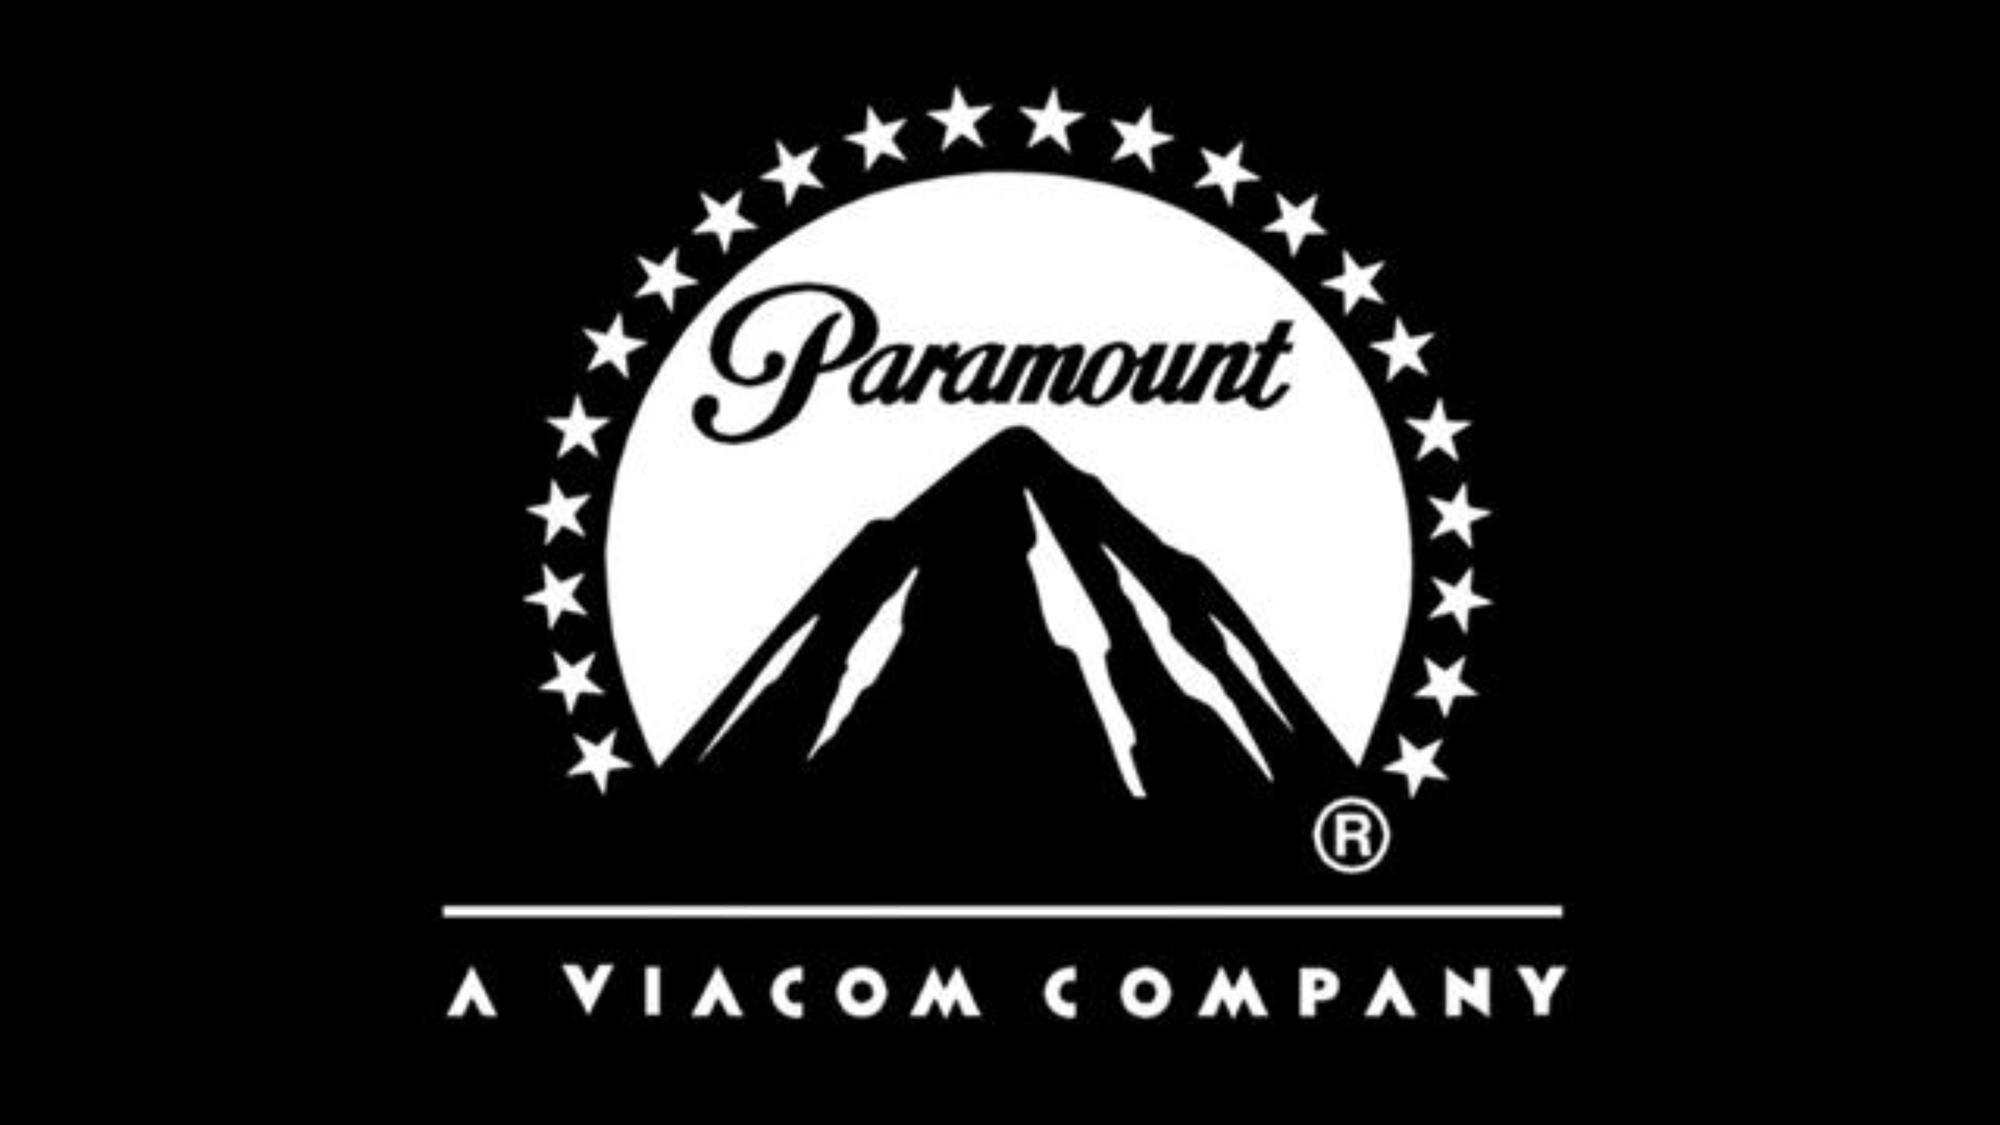 paramount logo black and white - photo #1